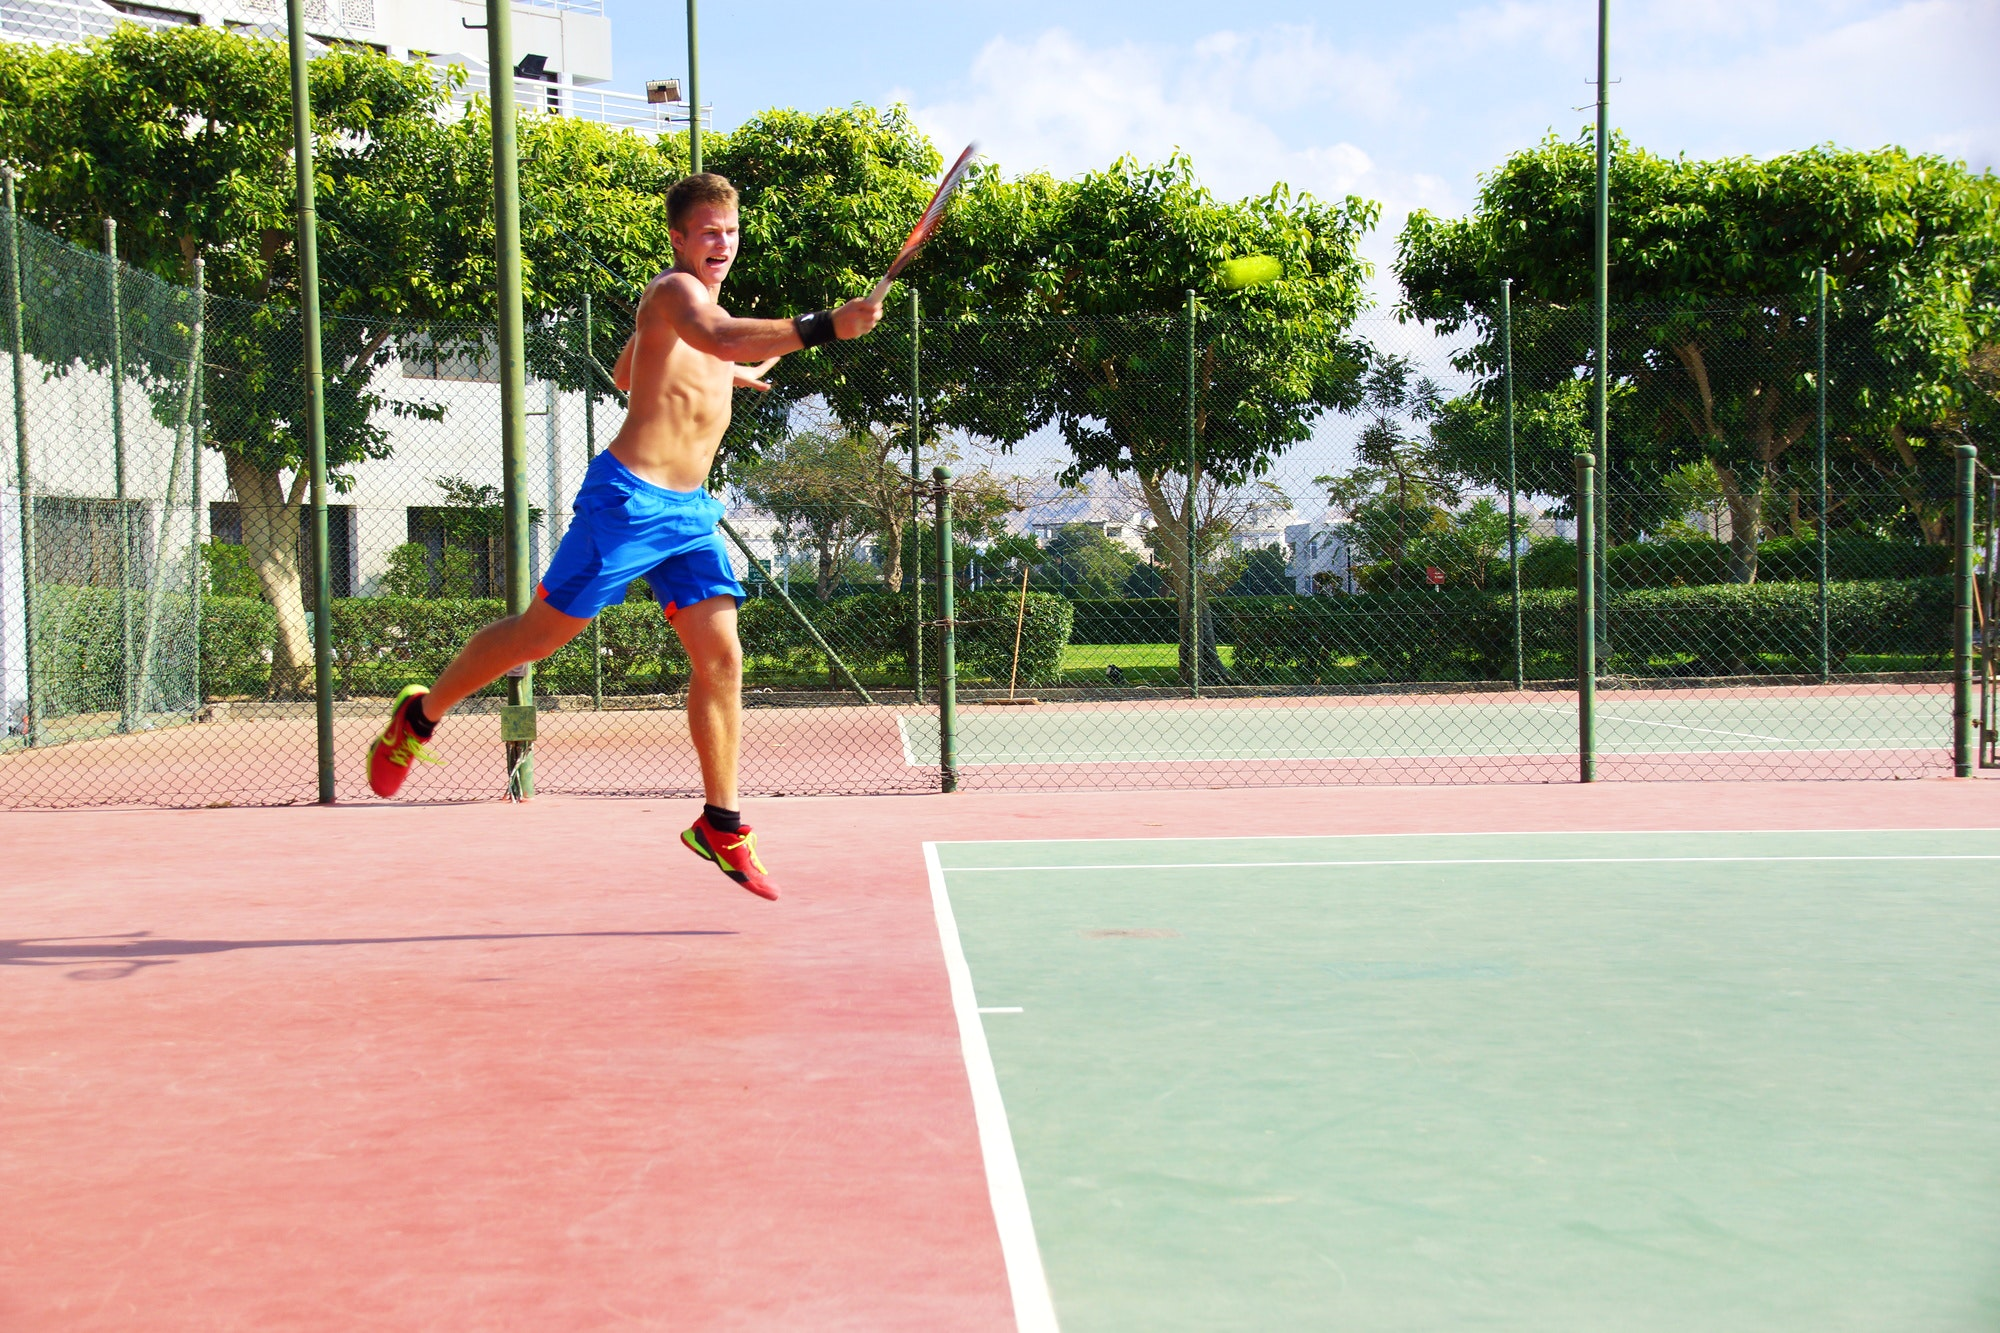 Patrick S. teaches tennis lessons in Davie, FL